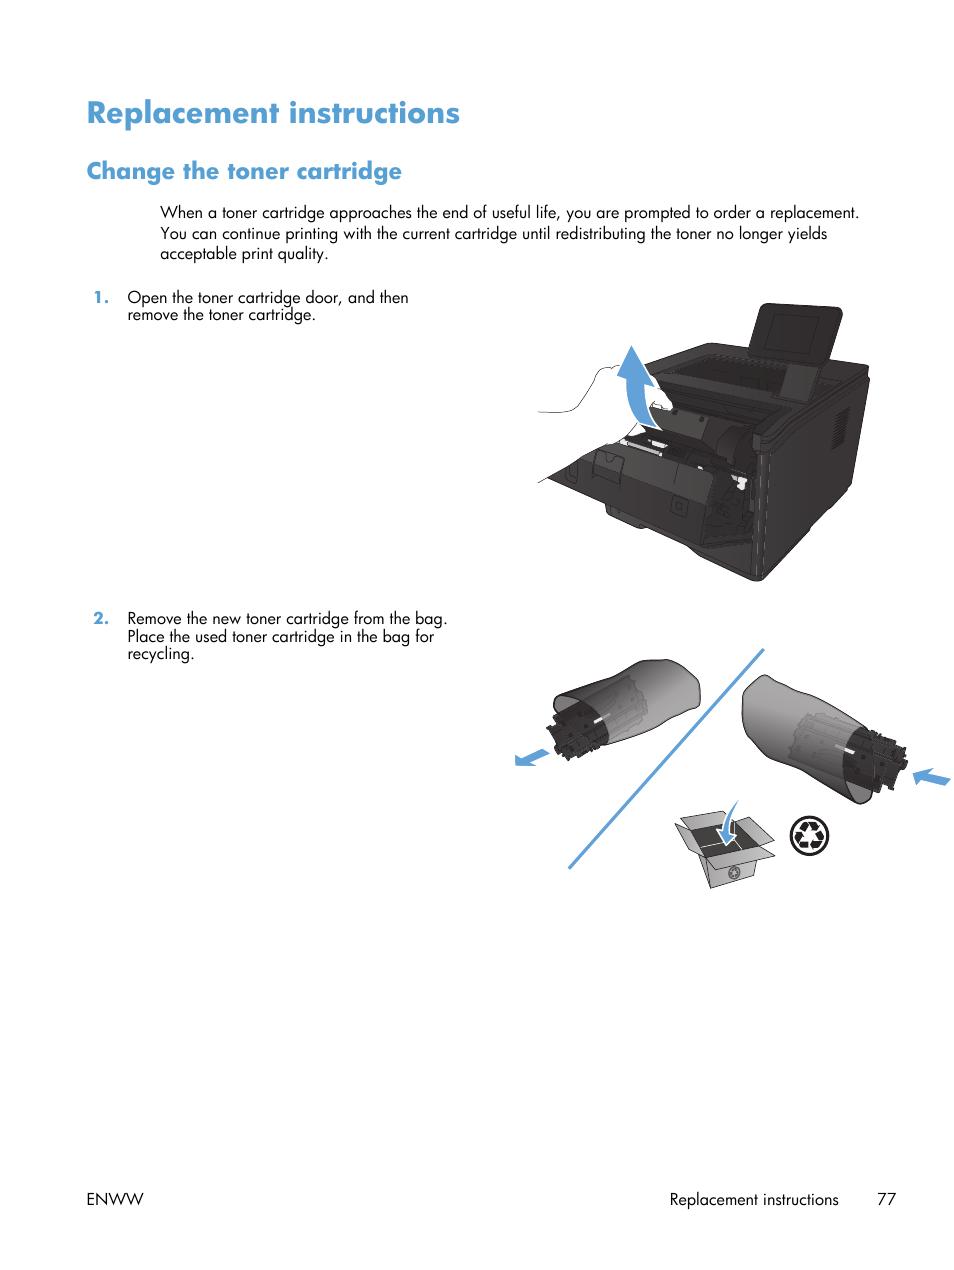 Replacement instructions, Change the toner cartridge | HP LaserJet Pro 400  Printer M401 series User